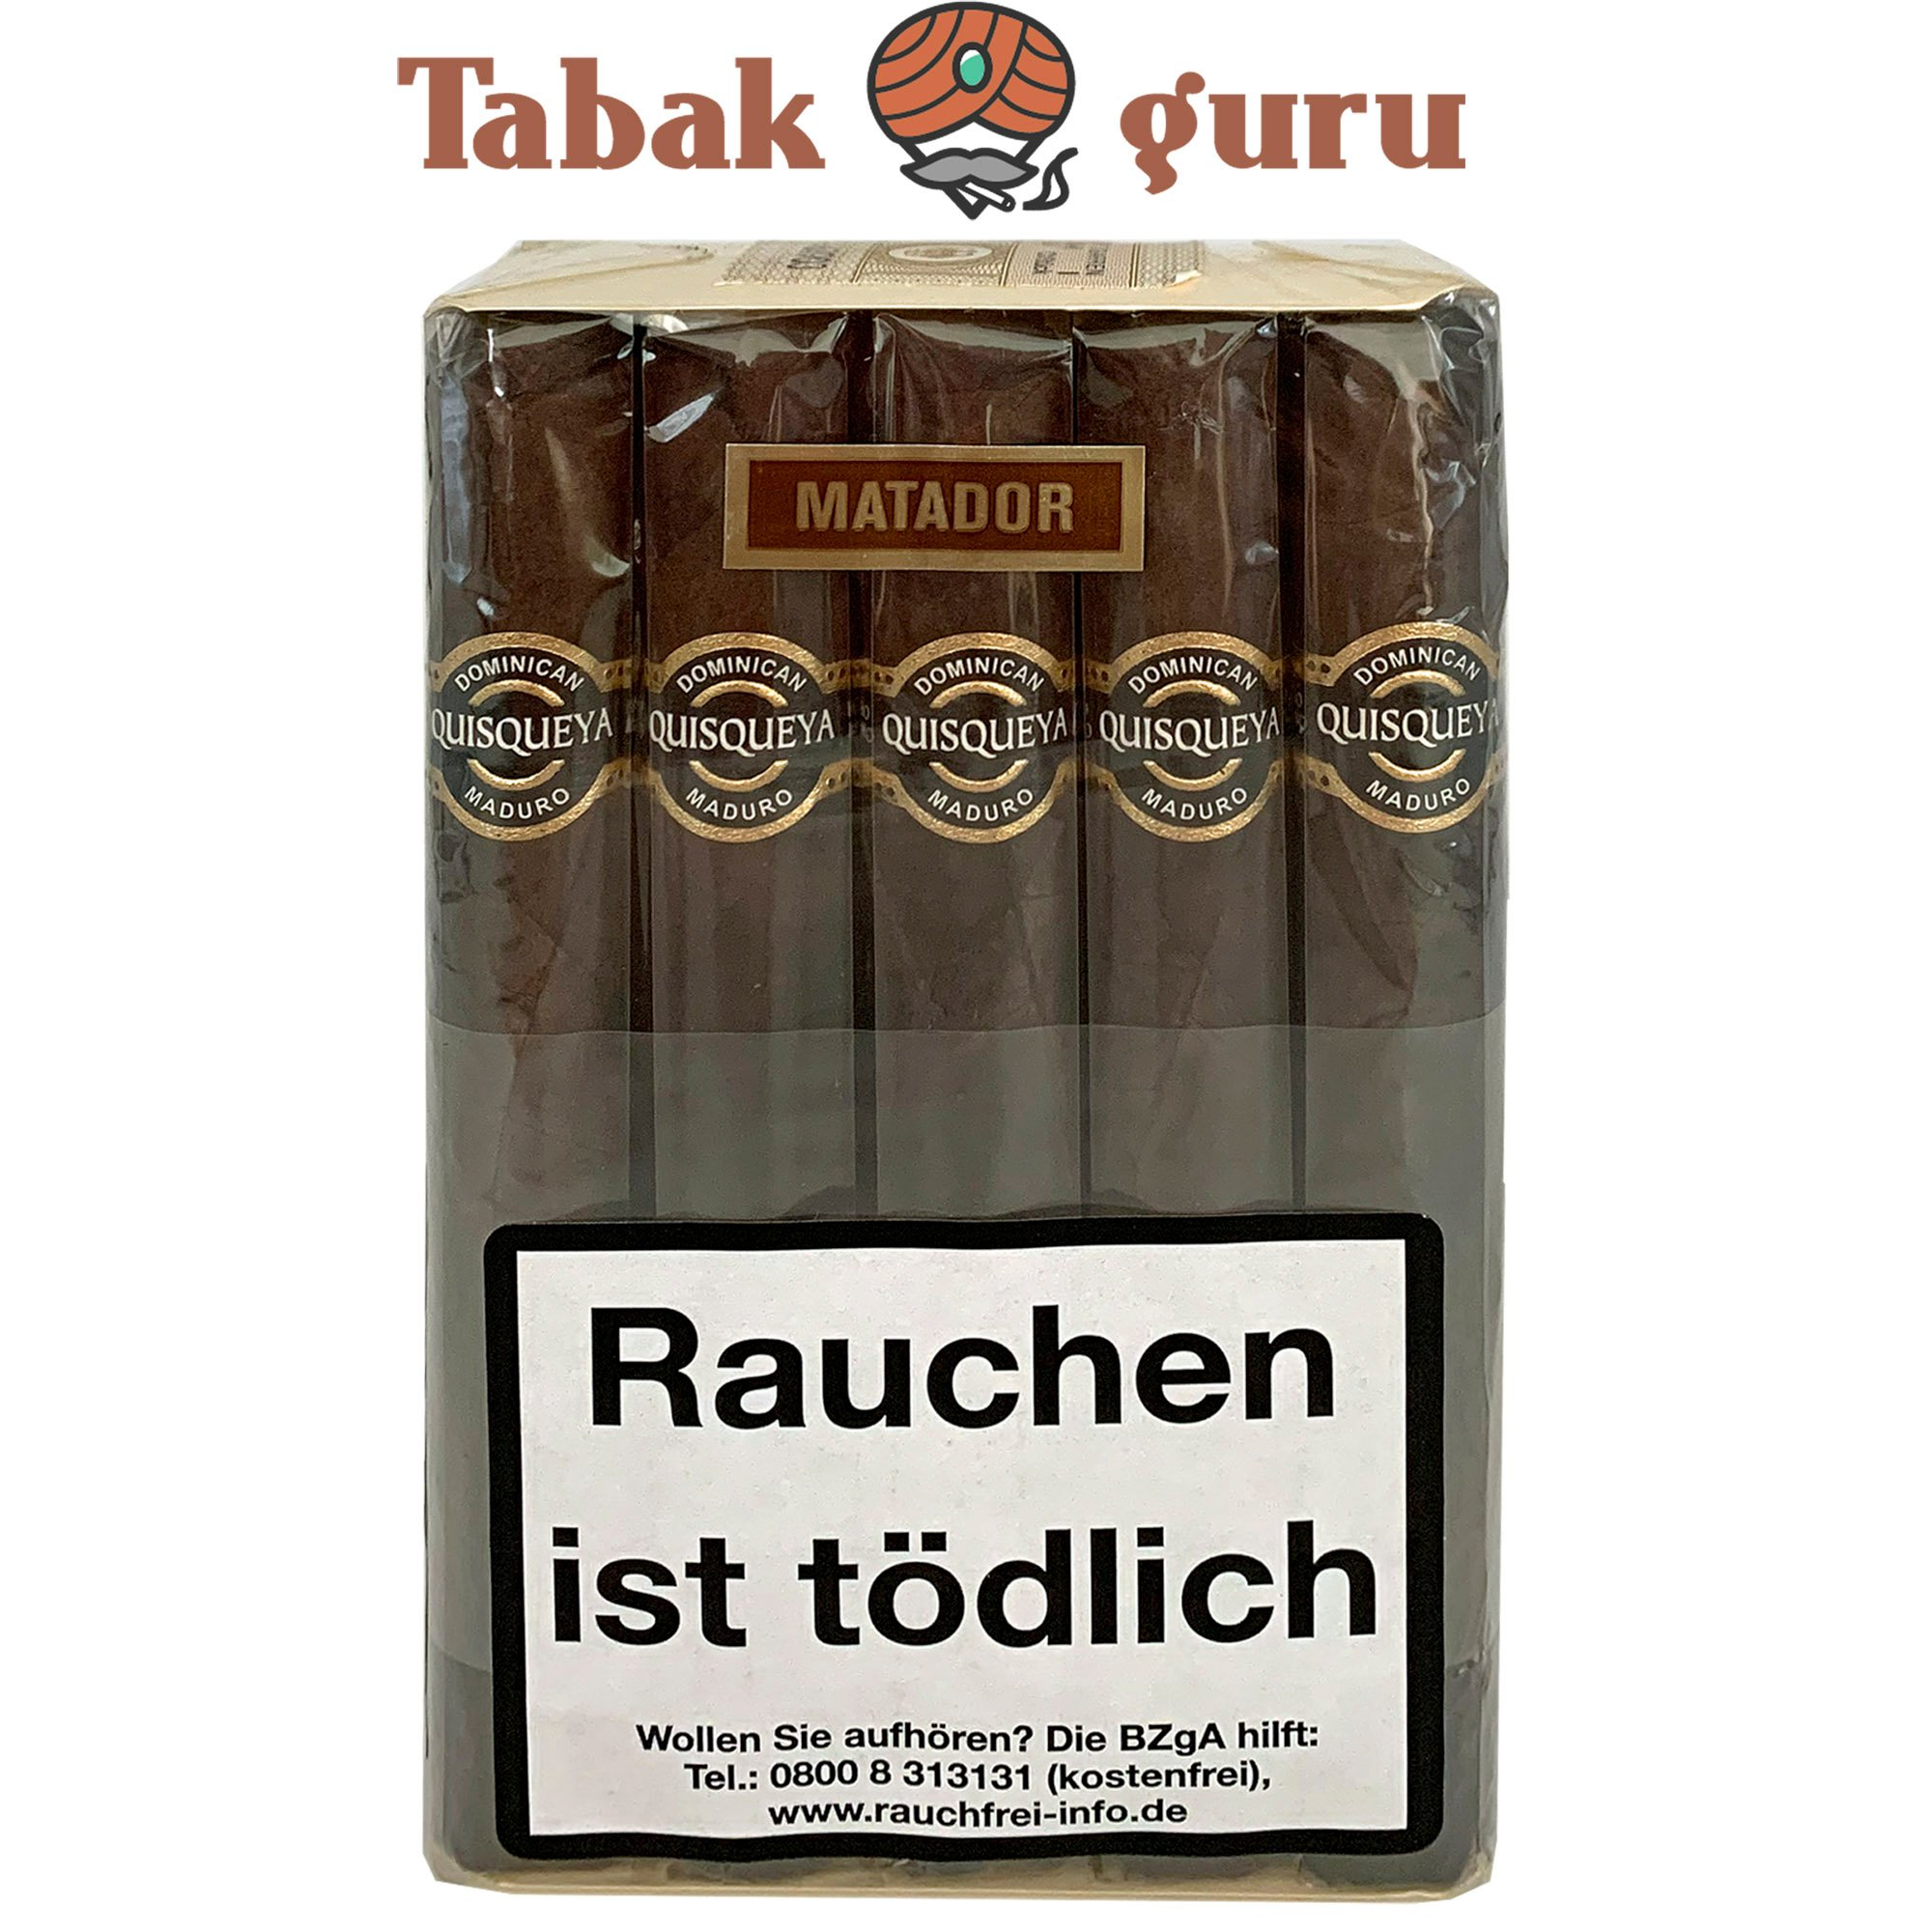 10 Quisqueya Maduro Zigarren im Matador Format